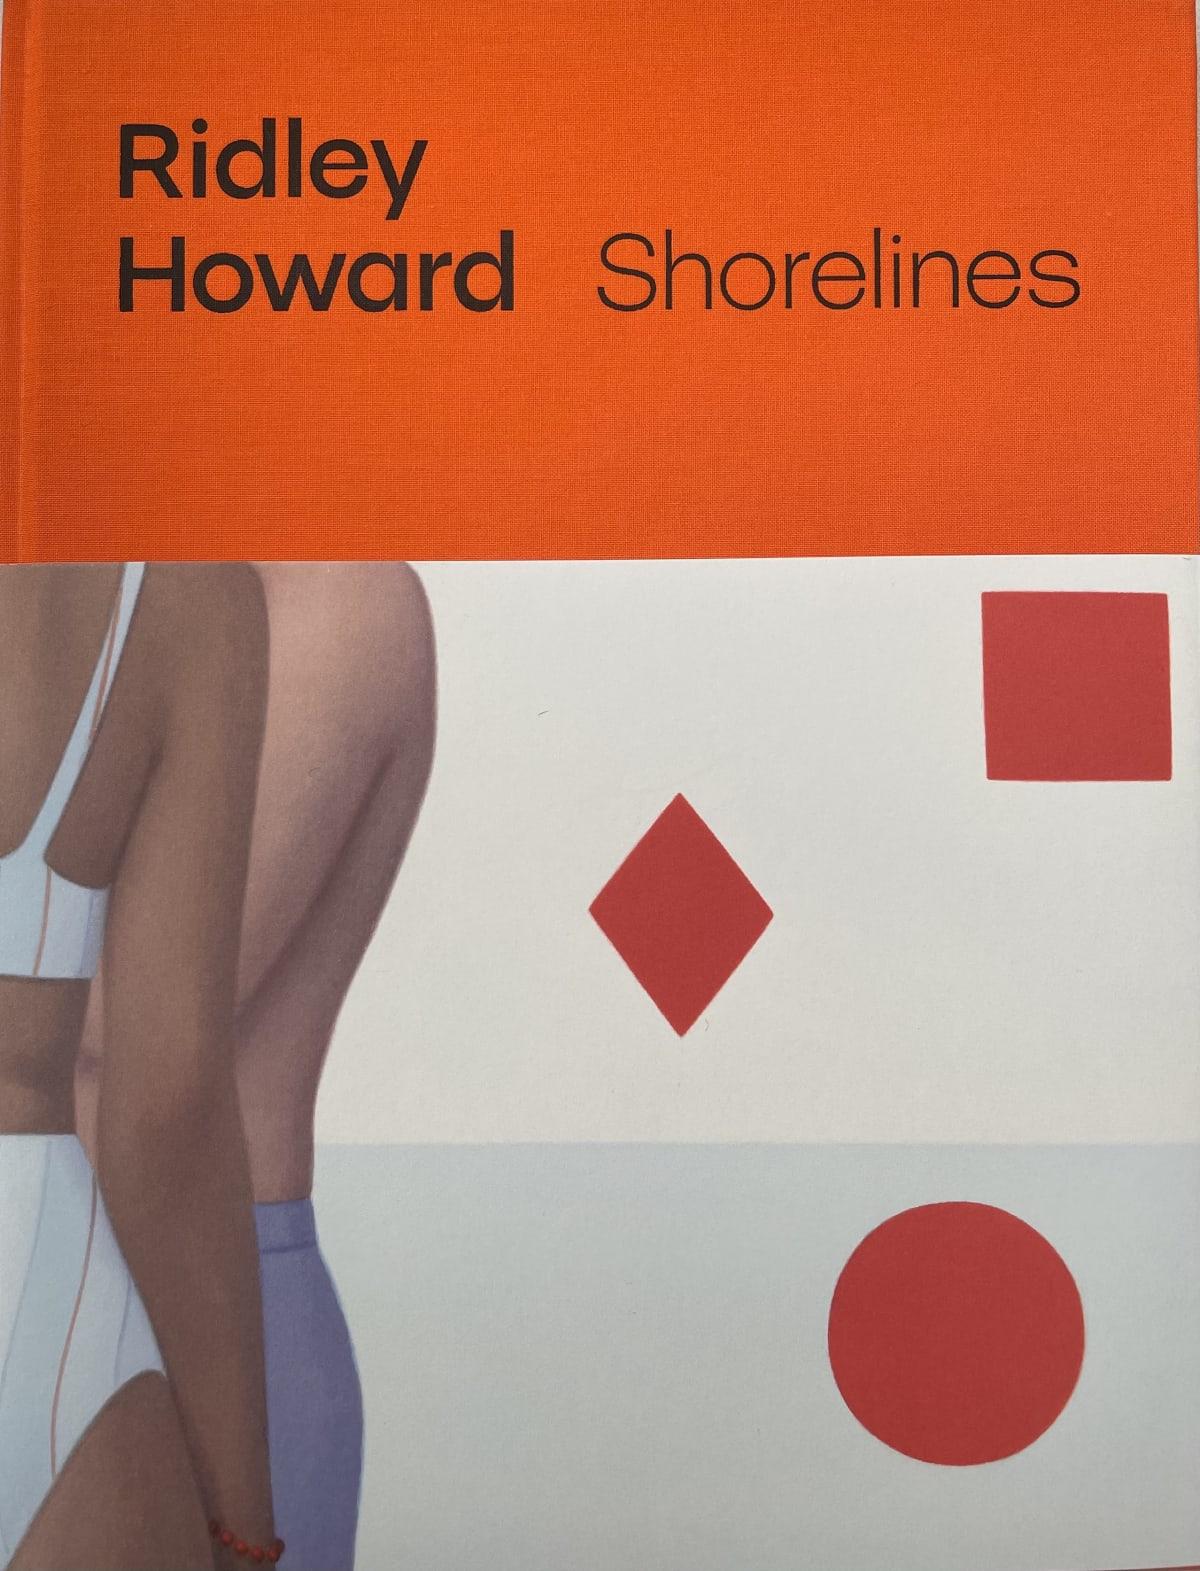 Ridley Howard